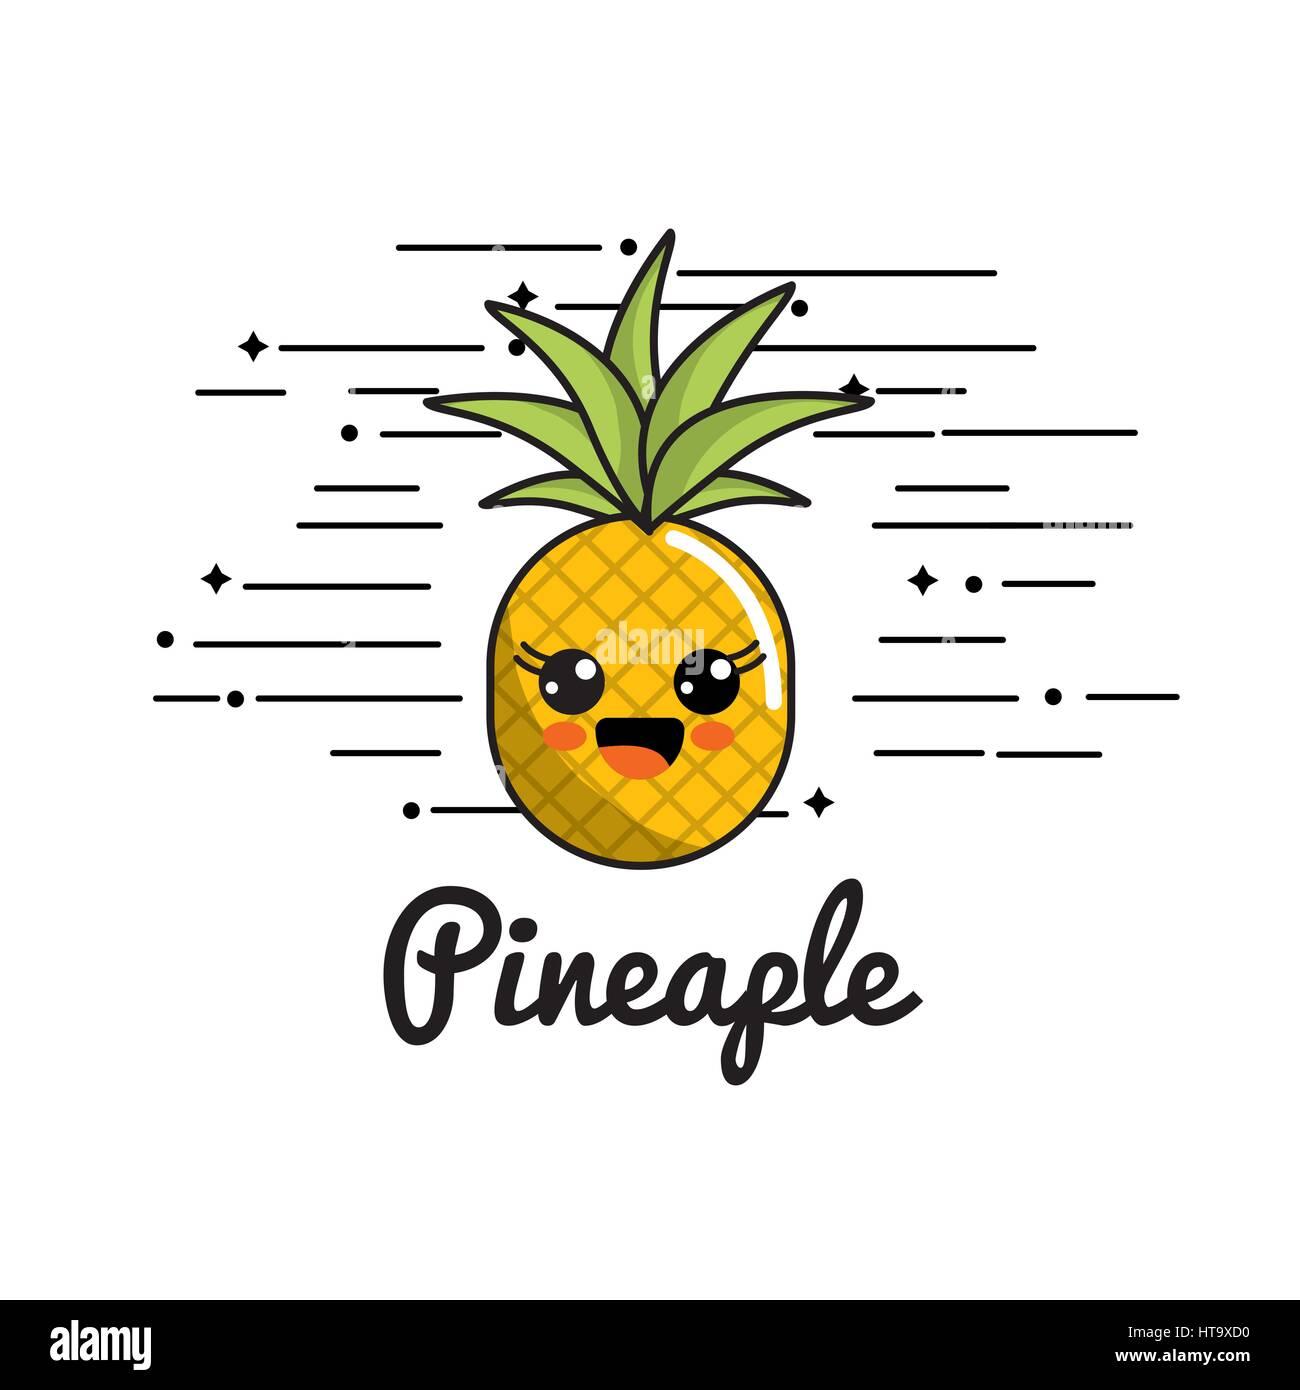 Emblem Kawaii glücklich Ananas Symbol Vektor Abbildung ...